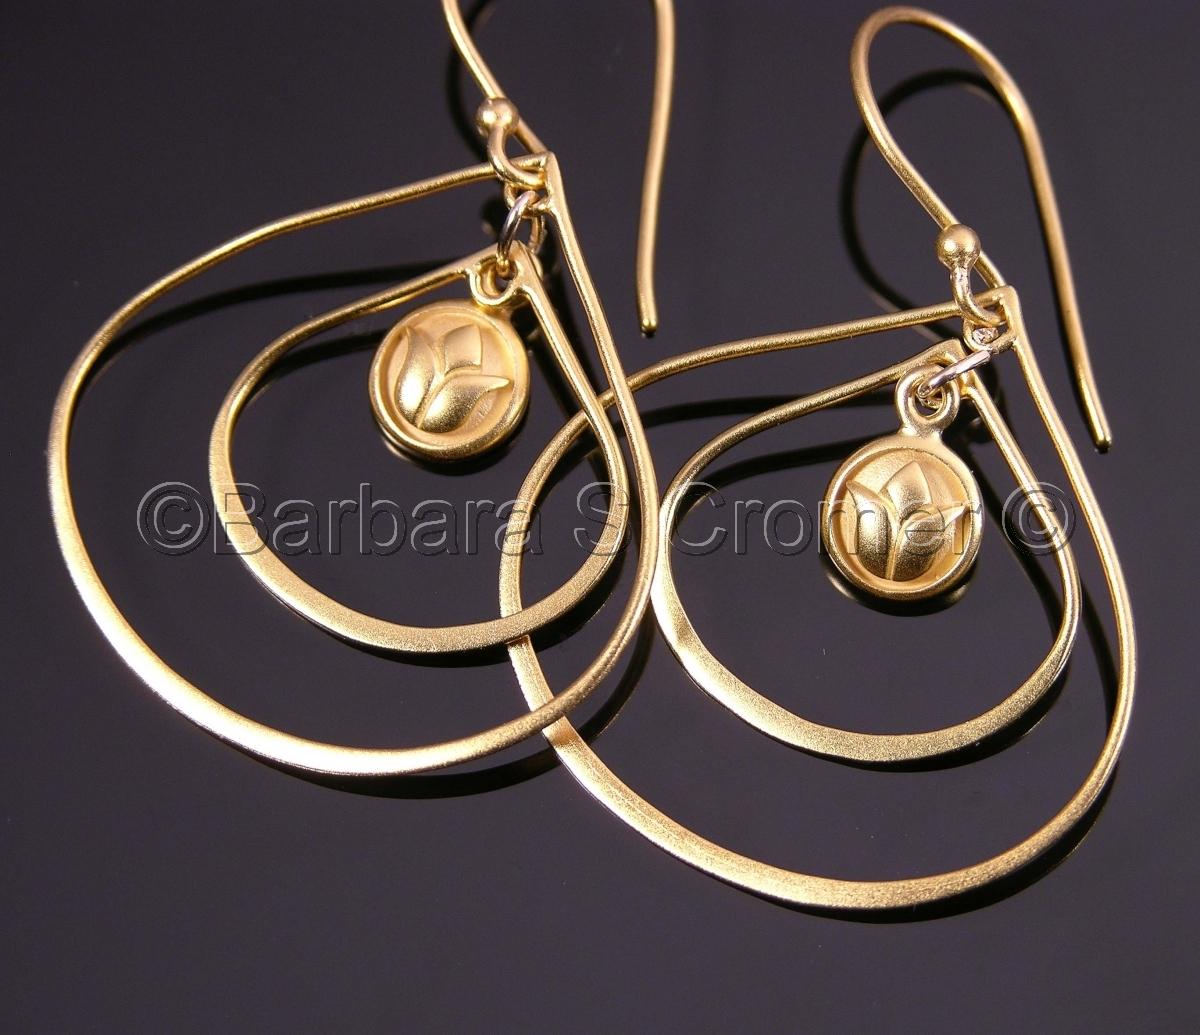 Handmade, vermeil teardrops, in two sizes,  handmade vermeil lotus charm, vermeil french ear wires. (large view)